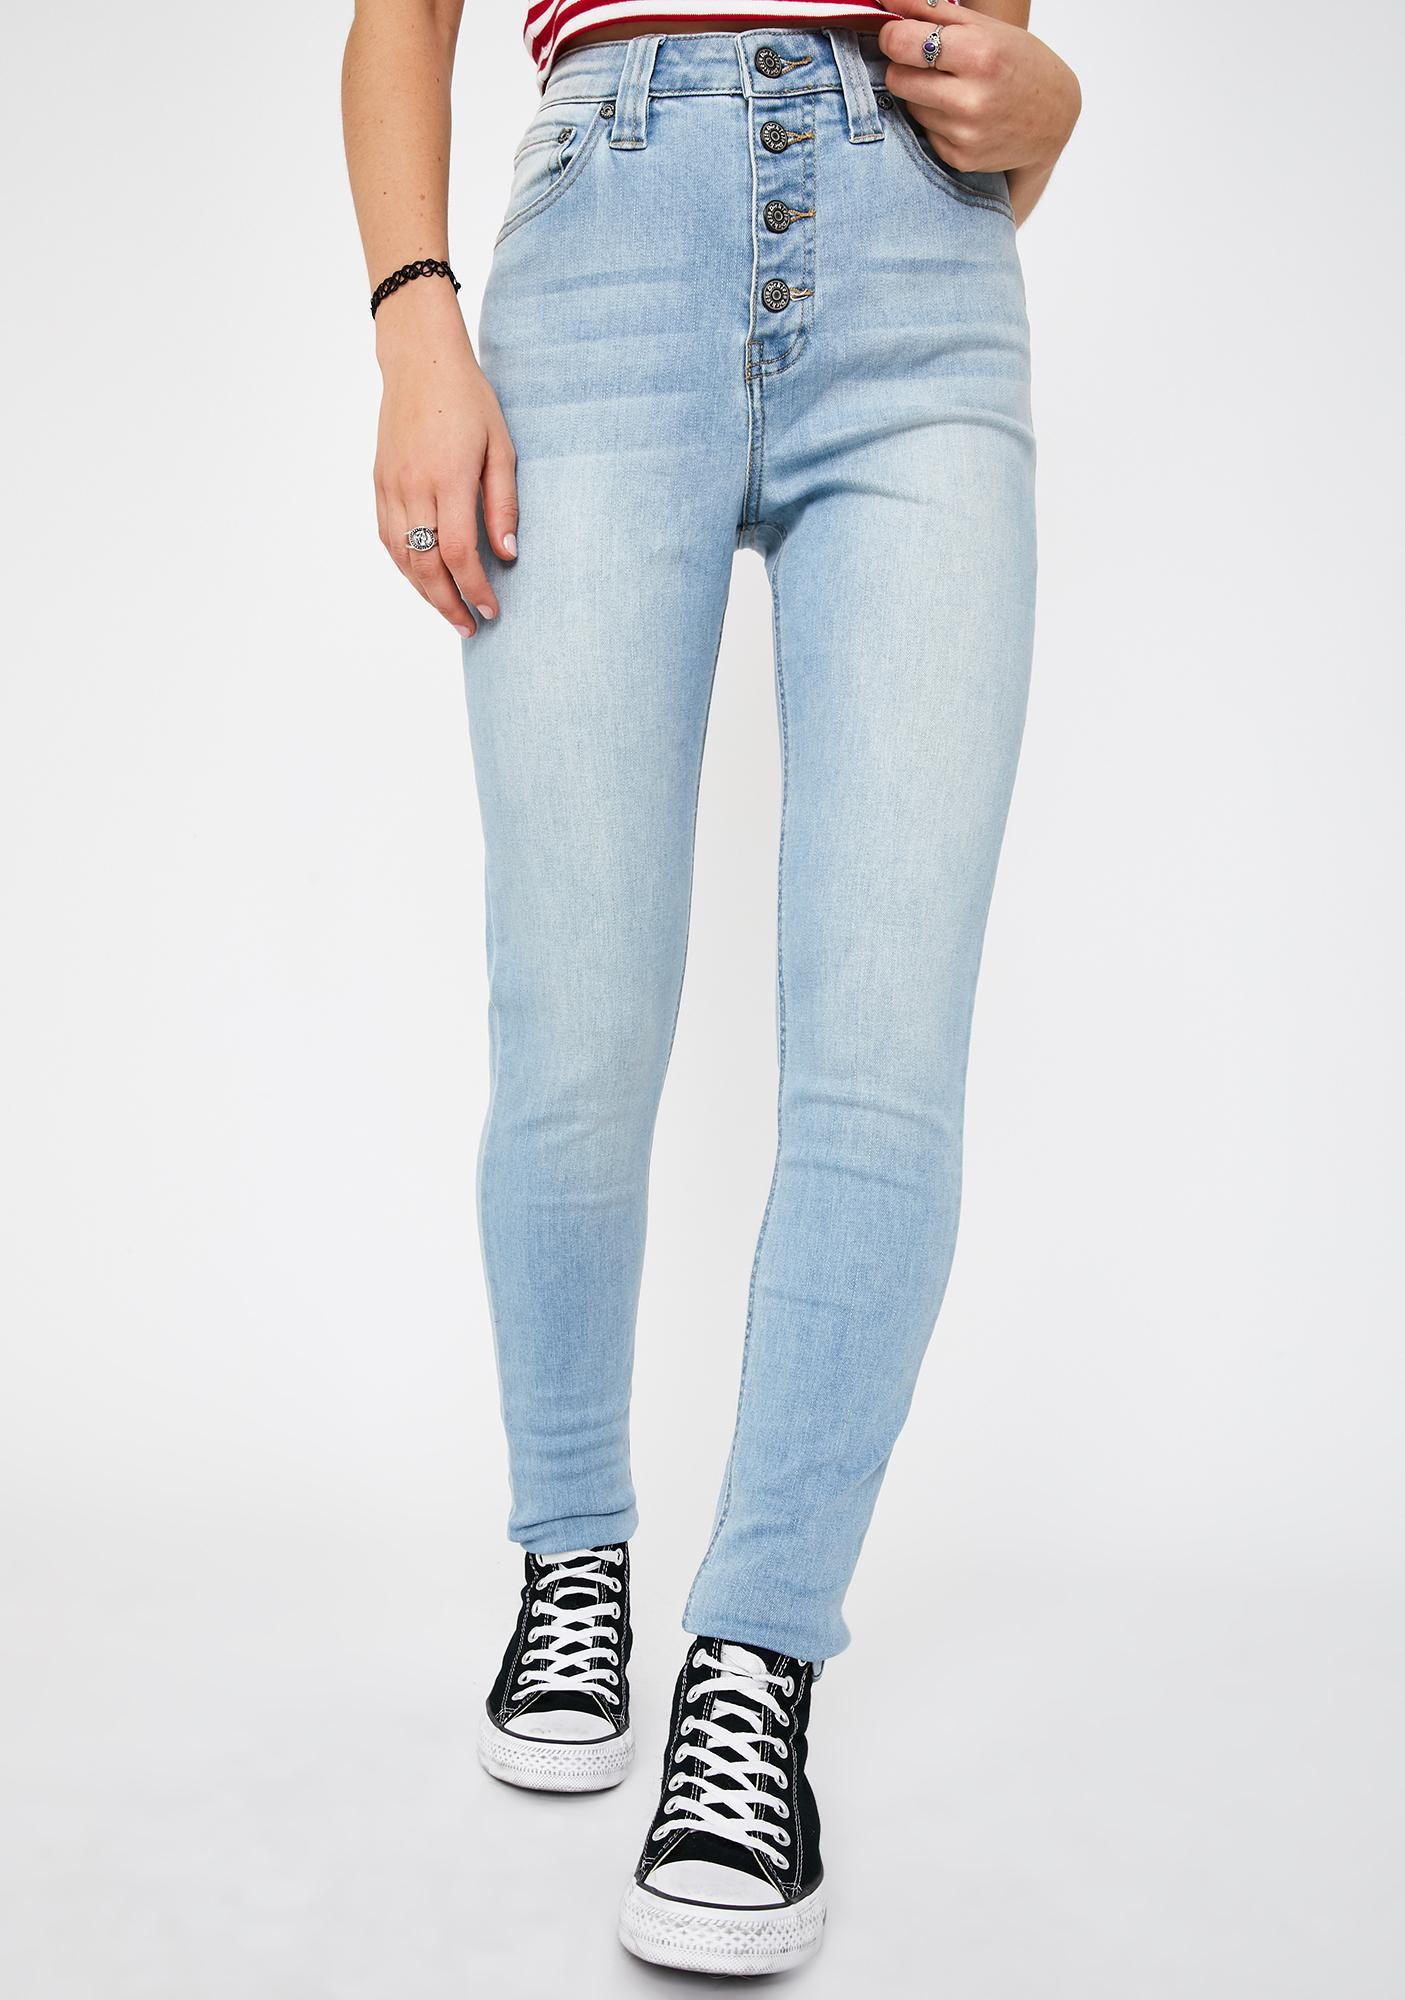 36,38,40,42,44,46 Short Regular Long Stretch d.blau NEU ANGELS Skinny Jeans Gr